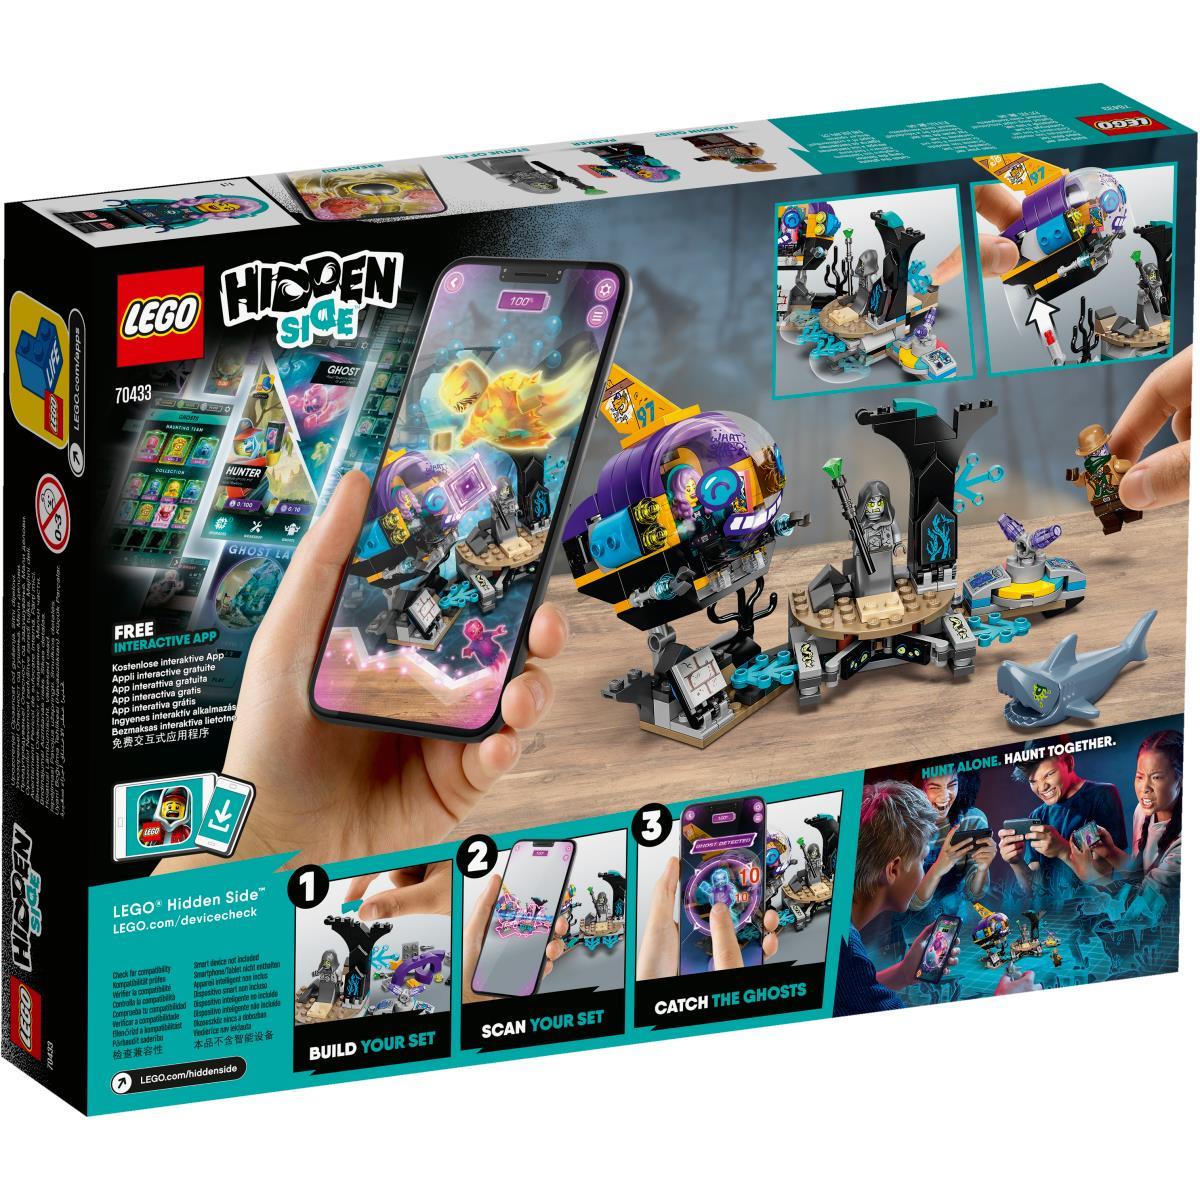 lego-hidden-side-70433-j-b-s-ubat (3)